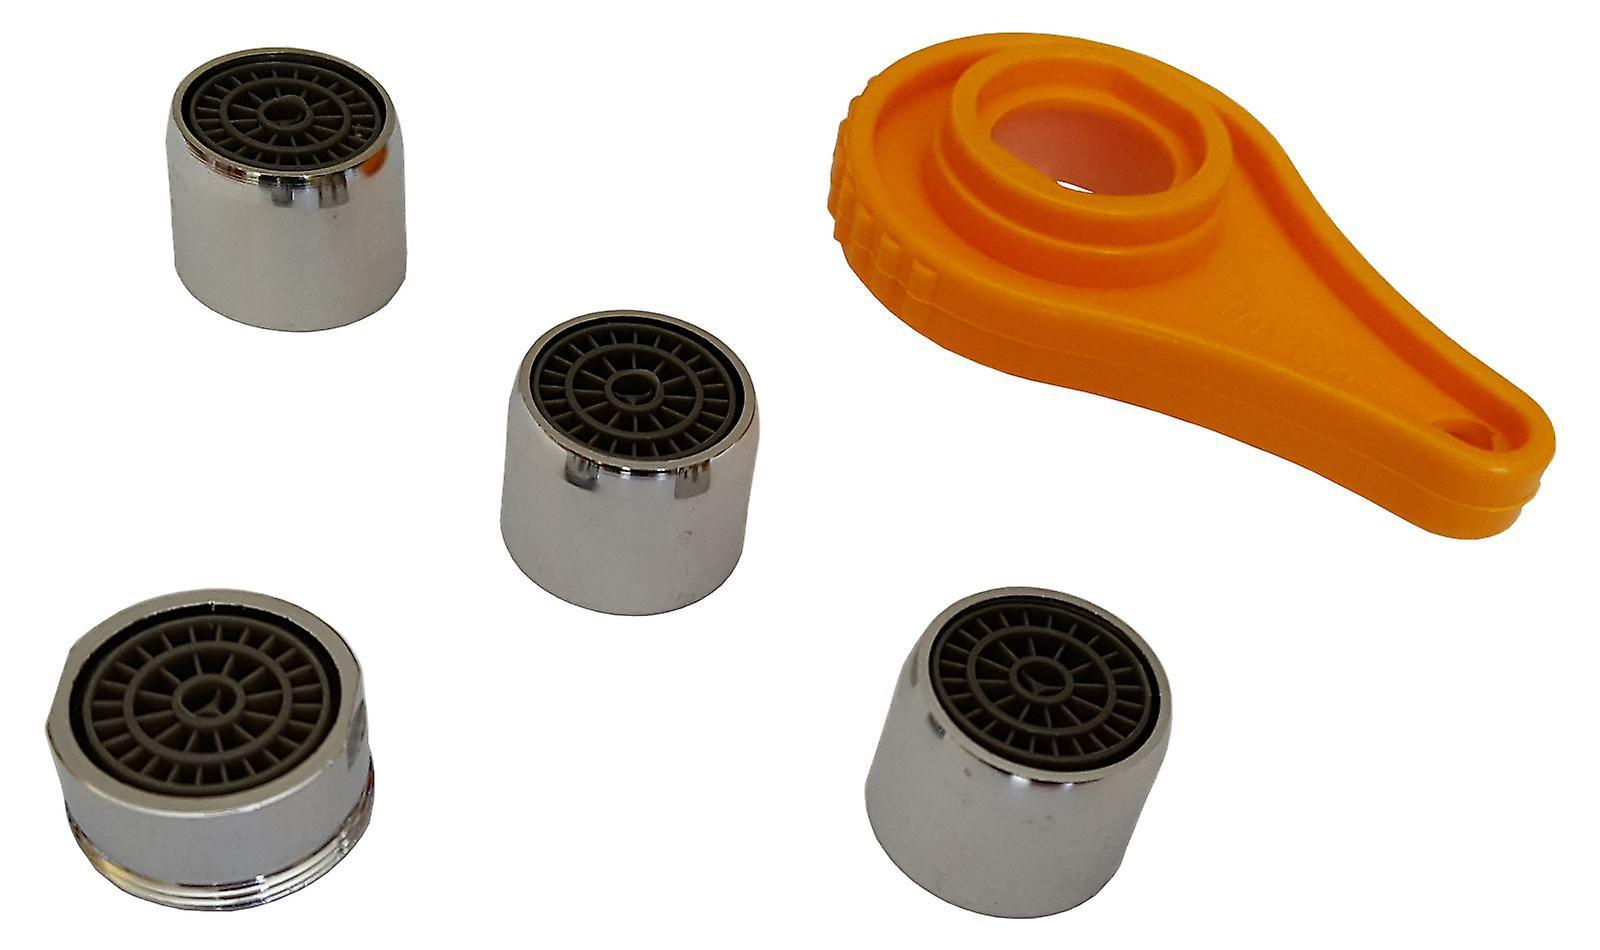 Bathroom Kitchen Faucet Tap Set Kit Aerators 1xM24mm + 3xF22m + Opening Tool